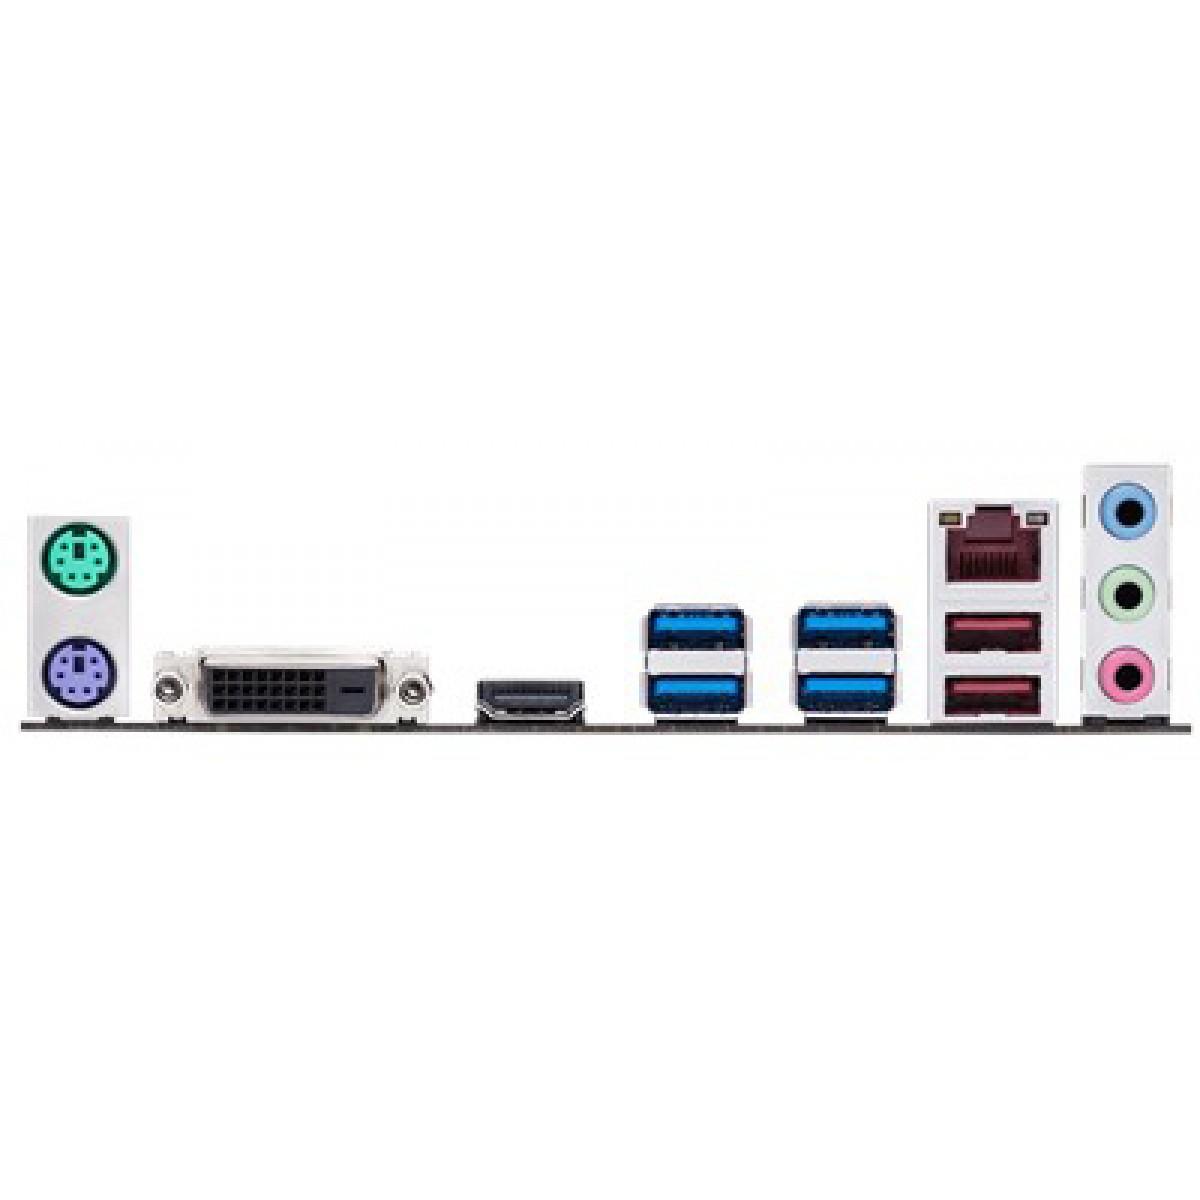 Placa Mãe Asus Ex-A320M-Gaming, Chipset A320, AMD AM4, ATX, DDR4